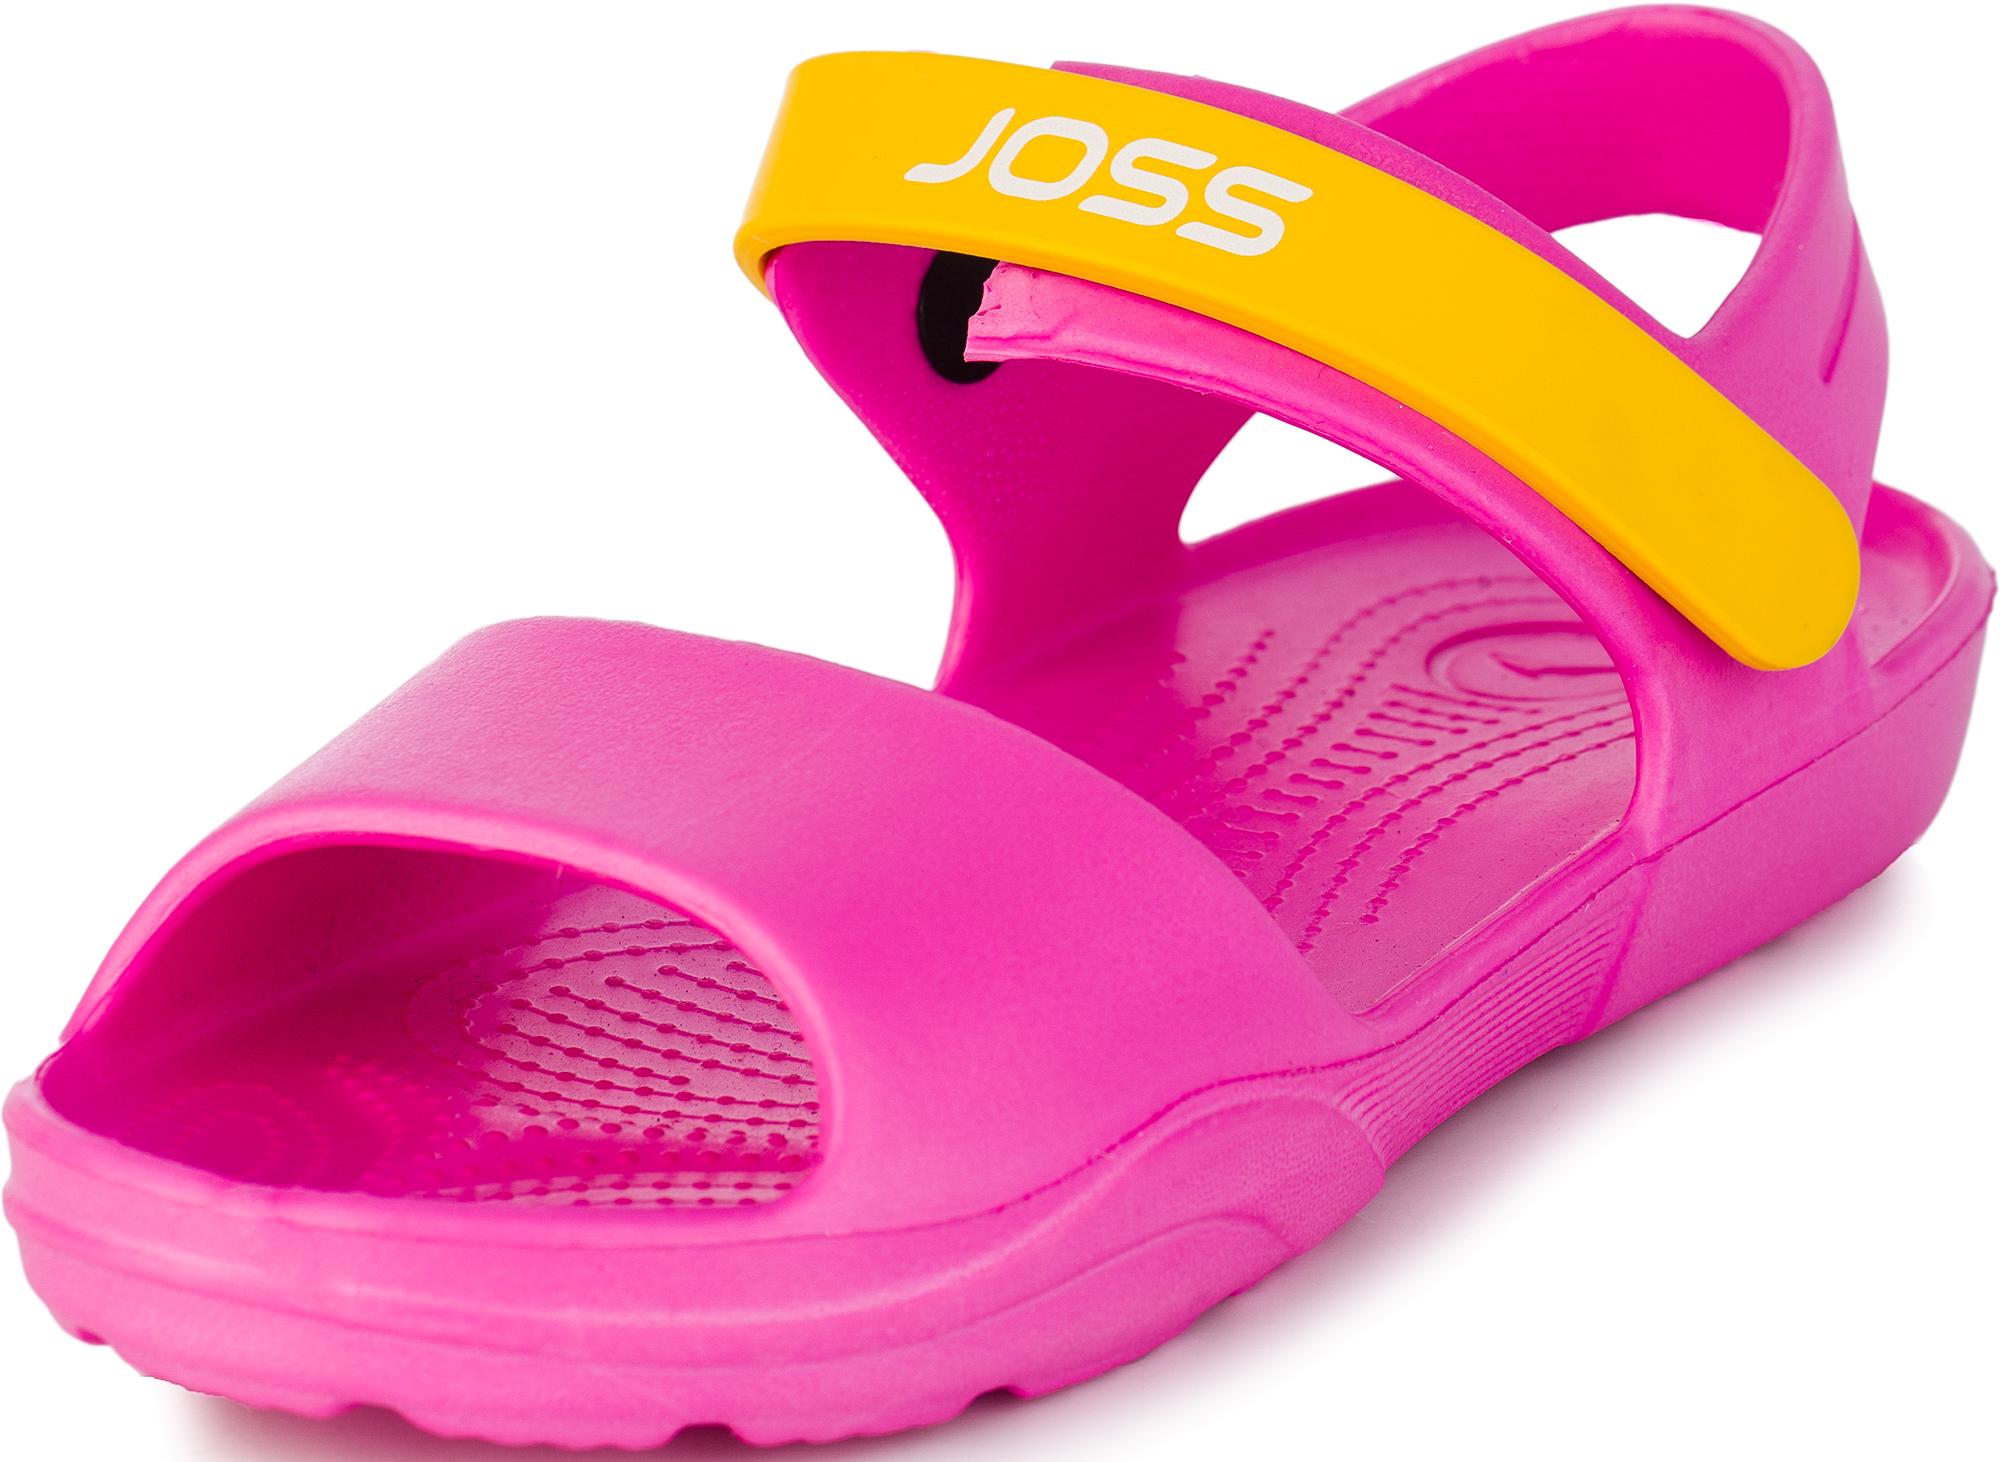 Joss Шлепанцы для девочек G-Sand, размер 30-31